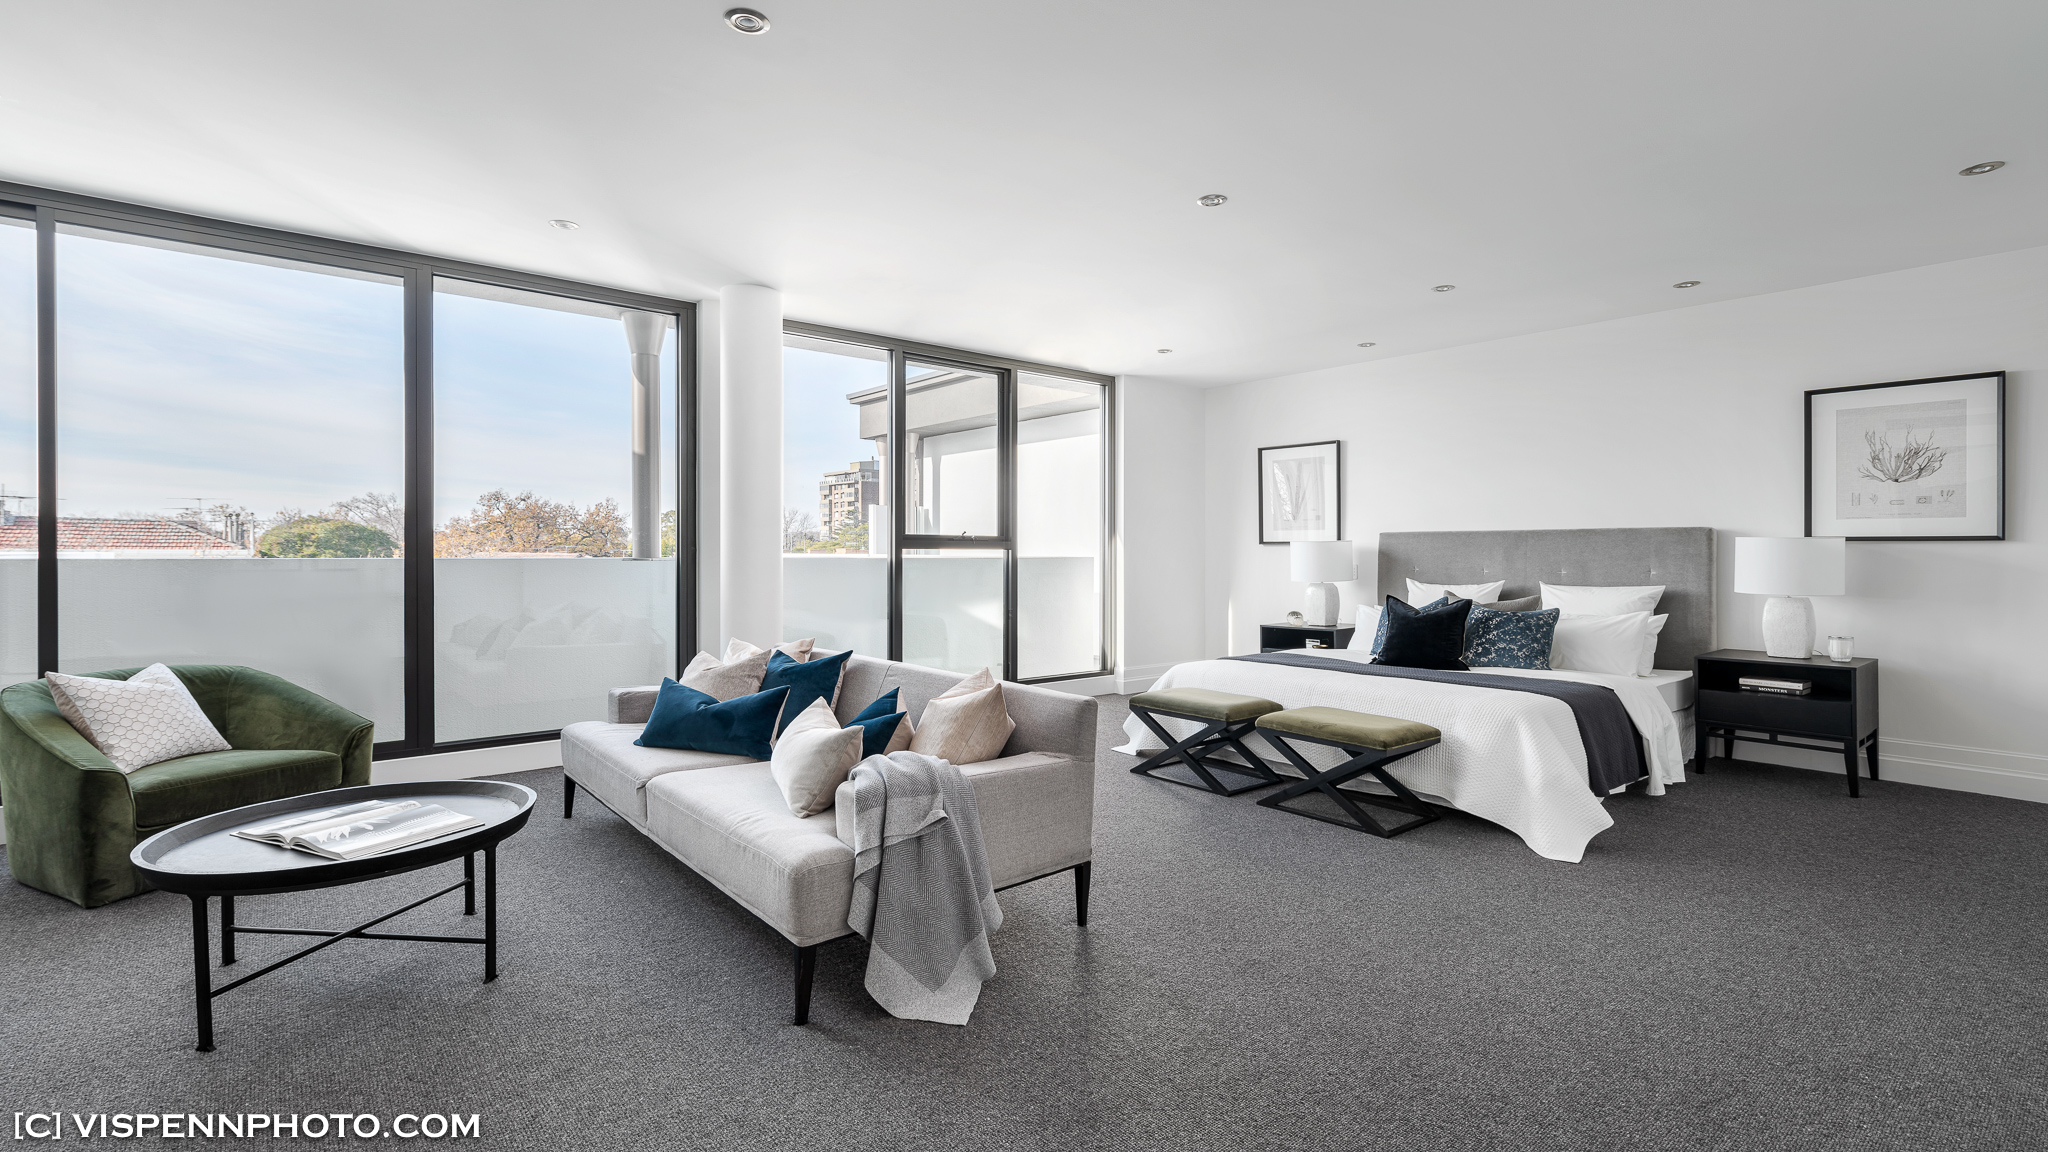 REAL ESTATE INTERIOR Photography Melbourne VISPENN 墨尔本 地产摄影 公寓拍摄 豪宅拍摄 VR远程看房 房产航拍 HAR00496 Edit